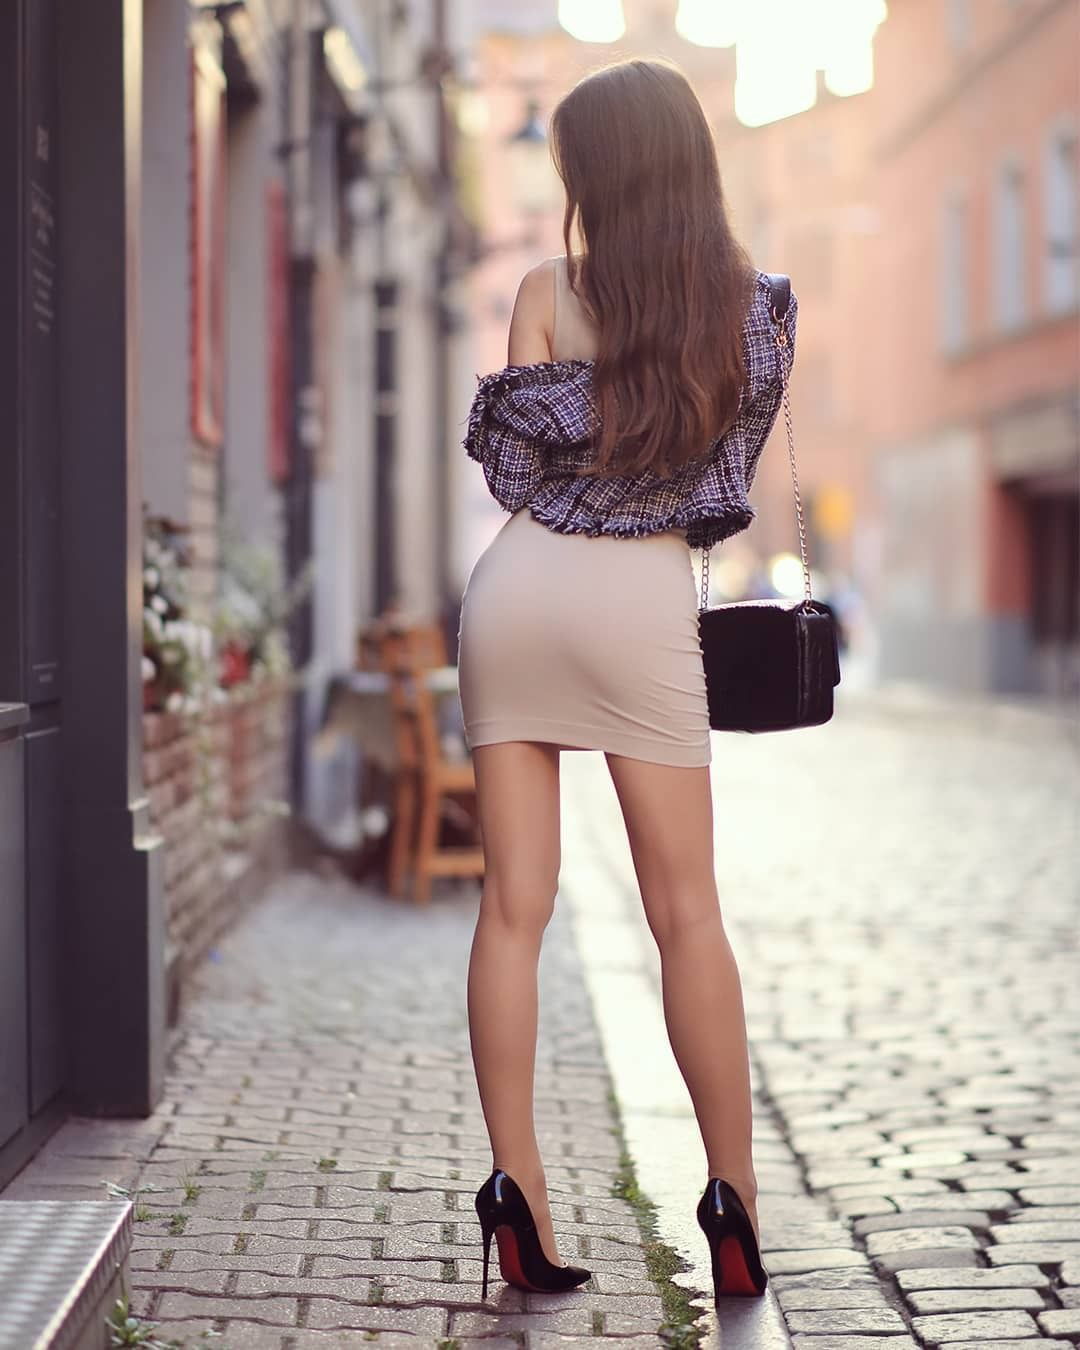 beautiful-twat-skirt-german-porn-hardcore